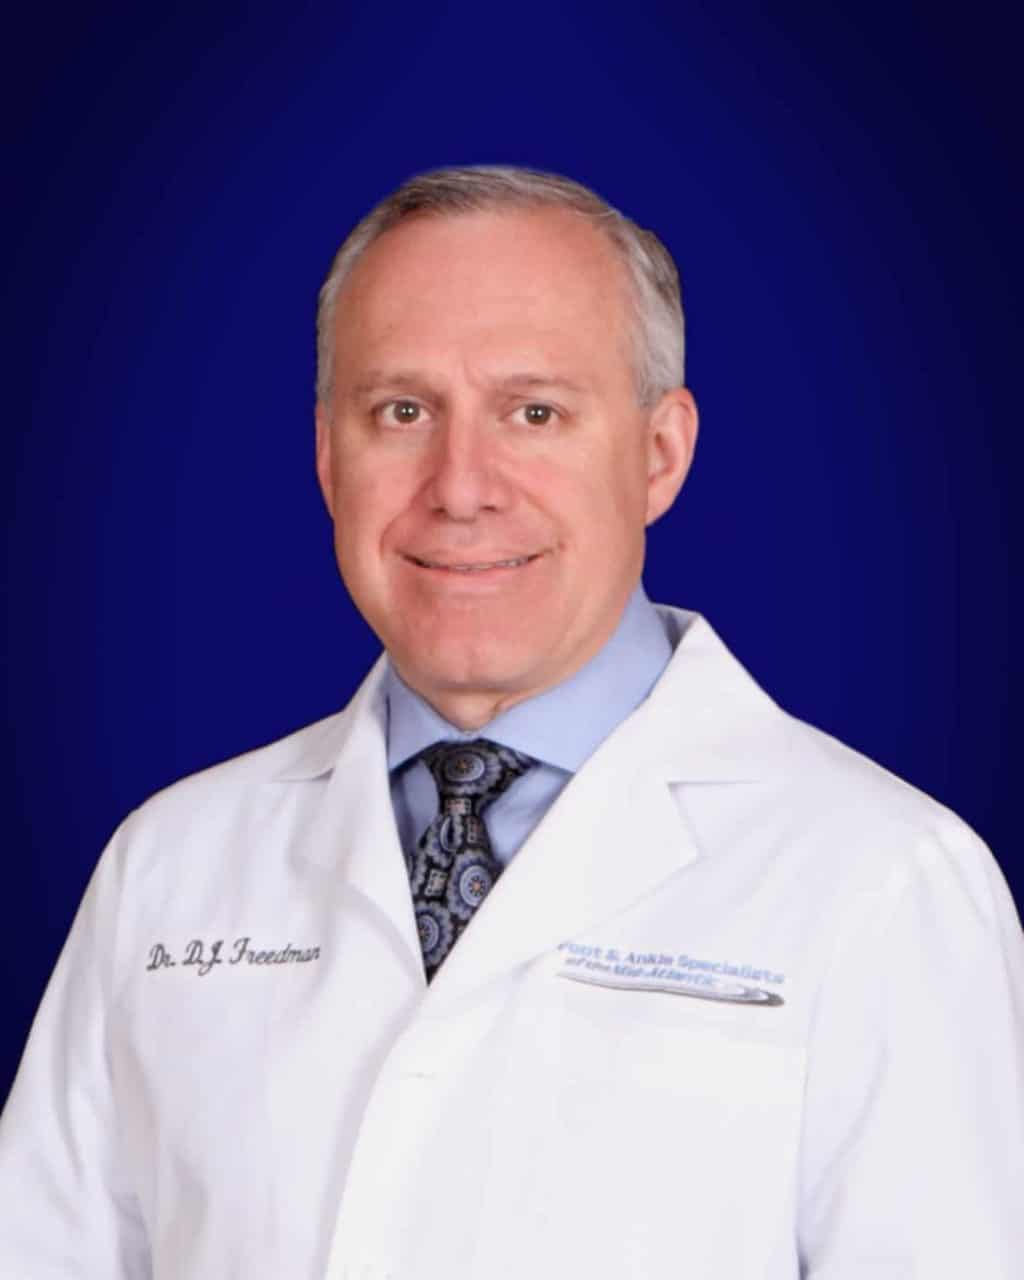 Dr. David Freedman